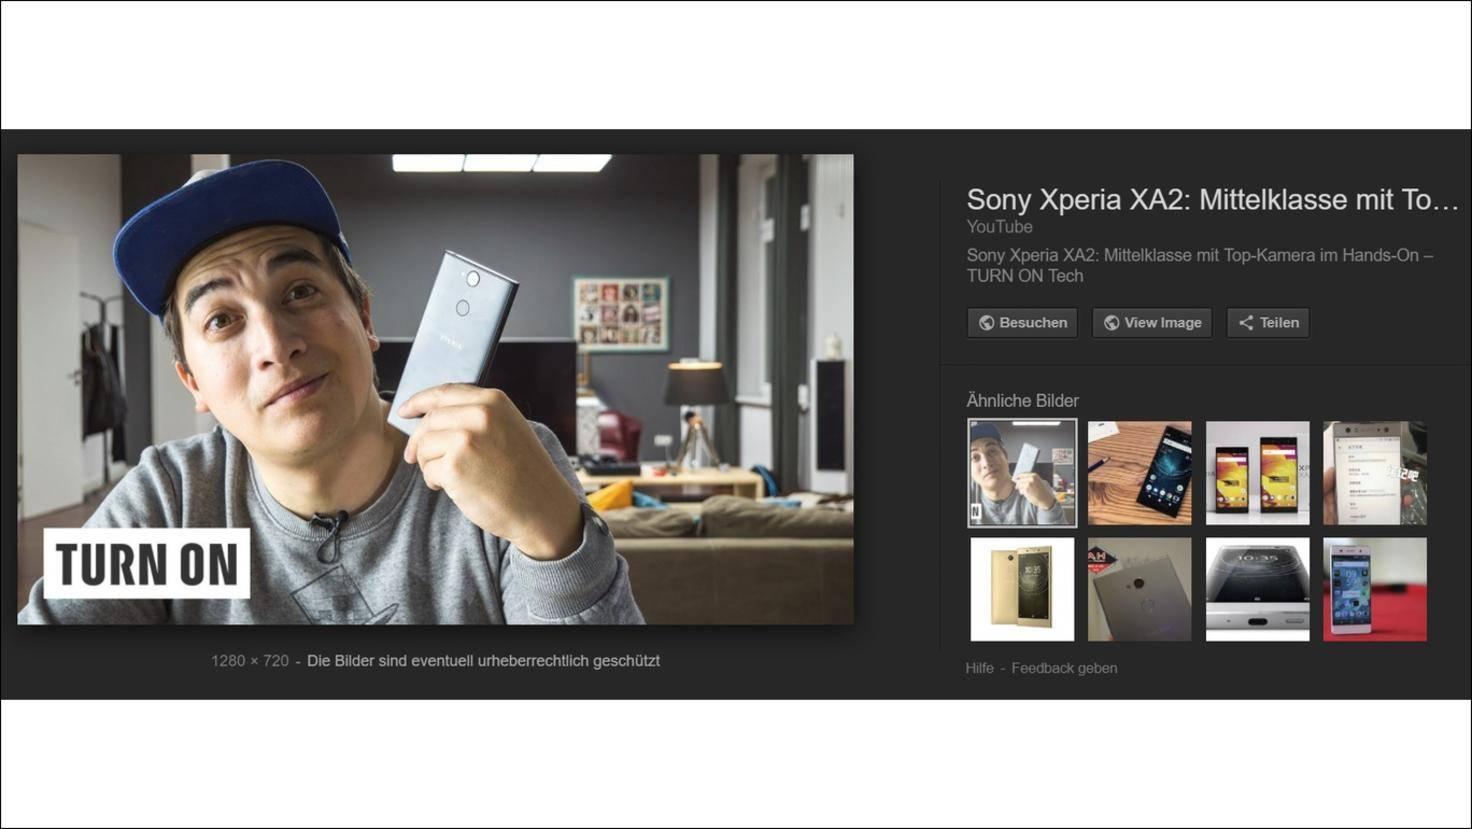 Sony-Xperia-XA2-Turn-On-Google-Bildersuche